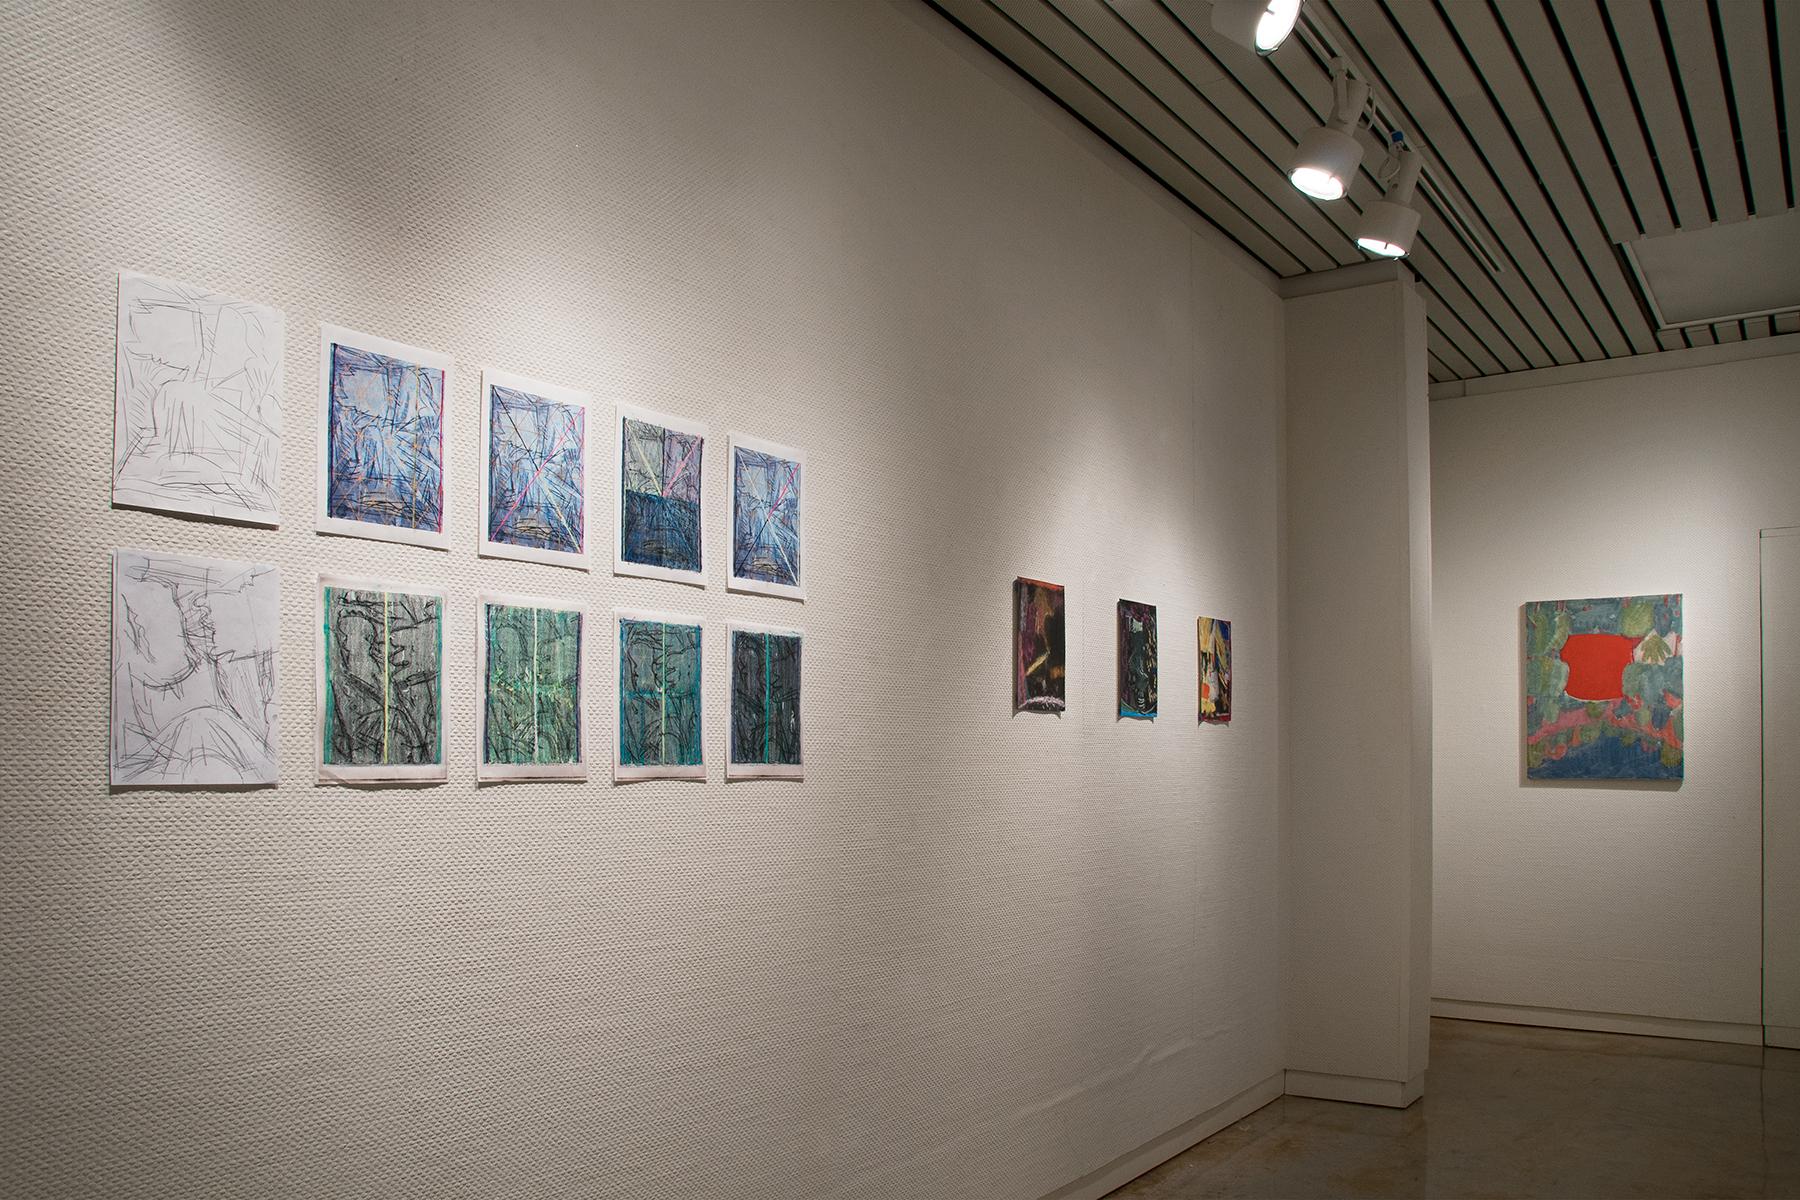 here (solo exhibition, 2nd venue)  Oct 24 - Dec 13, 2016 Diane Marek Visiting Artist Series UT Chattanooga, Chattanooga, TN